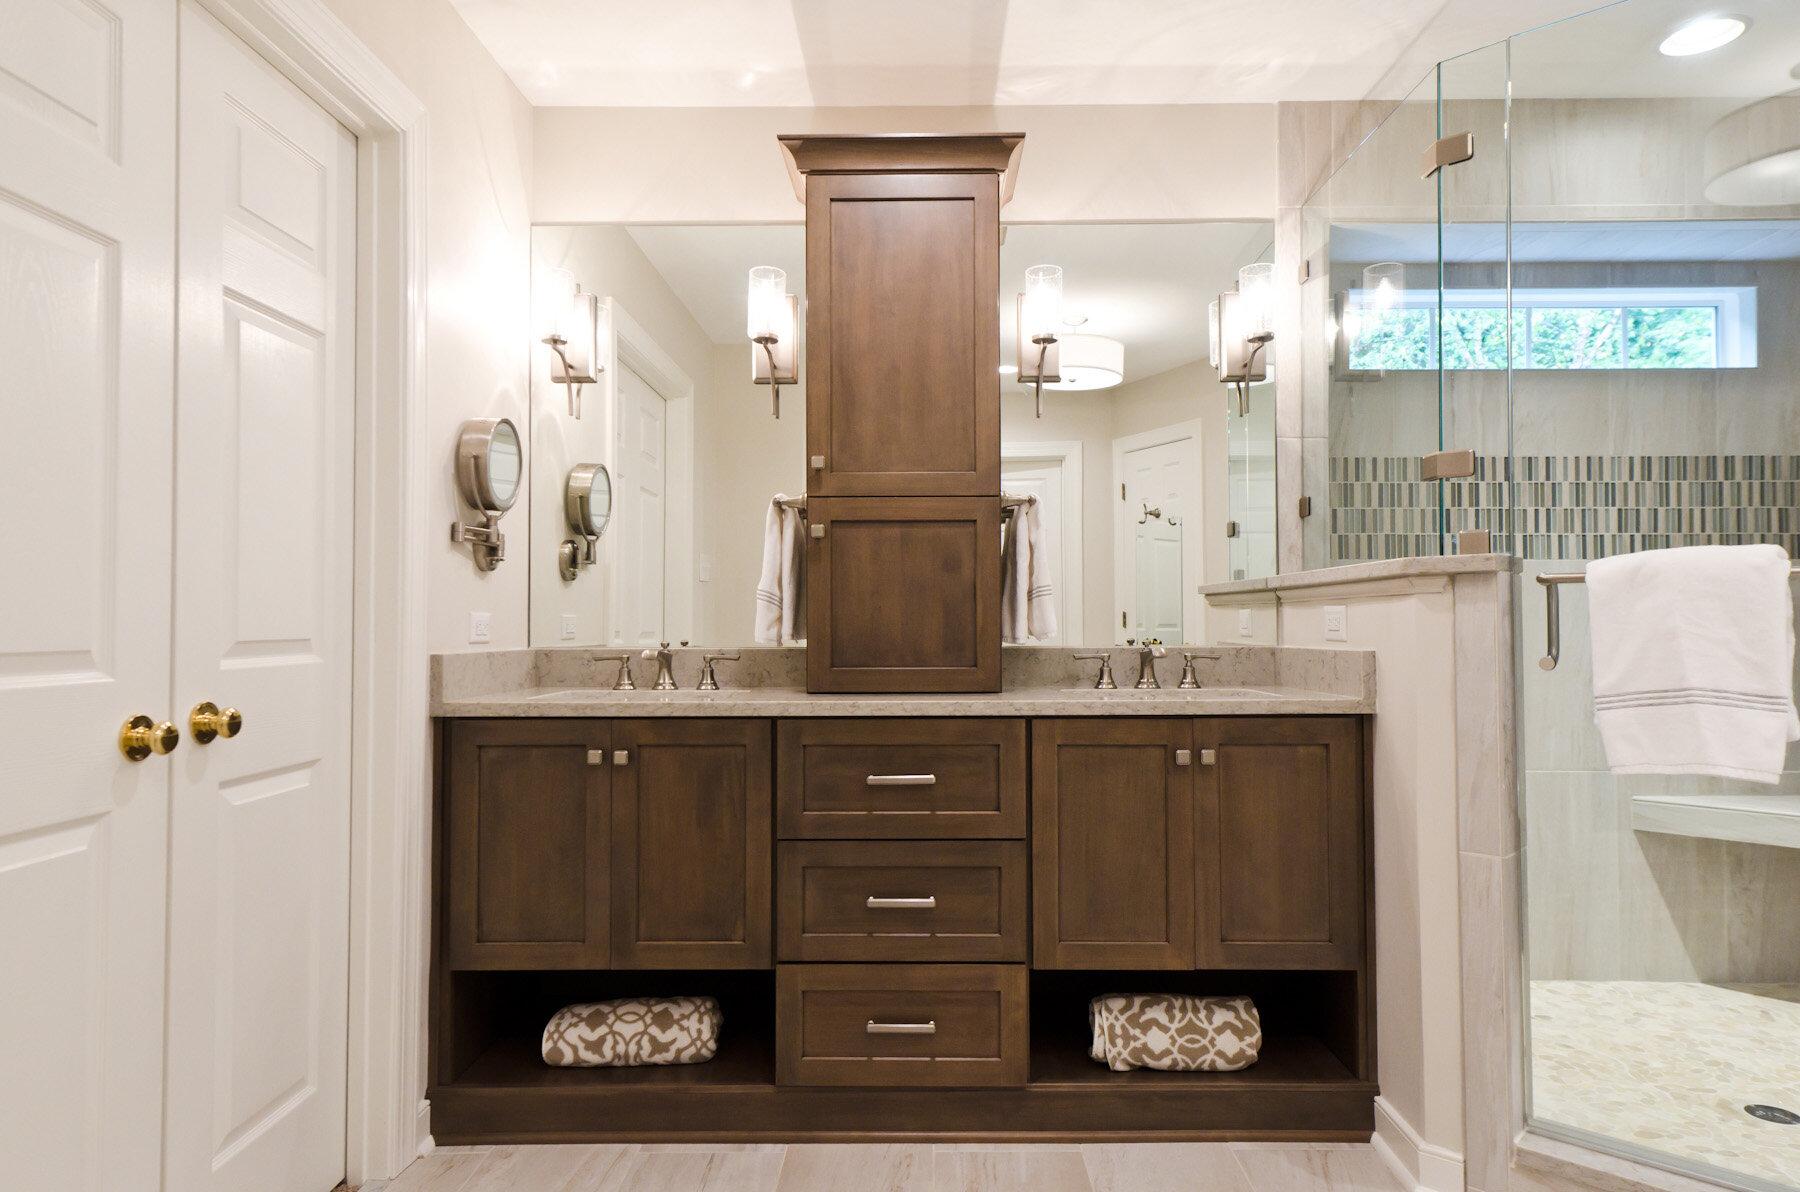 2019_CLI_Richmond_Virginia_Interior_Designer_Contractor_West_End_Master_Bathroom_Ryther-24.jpg